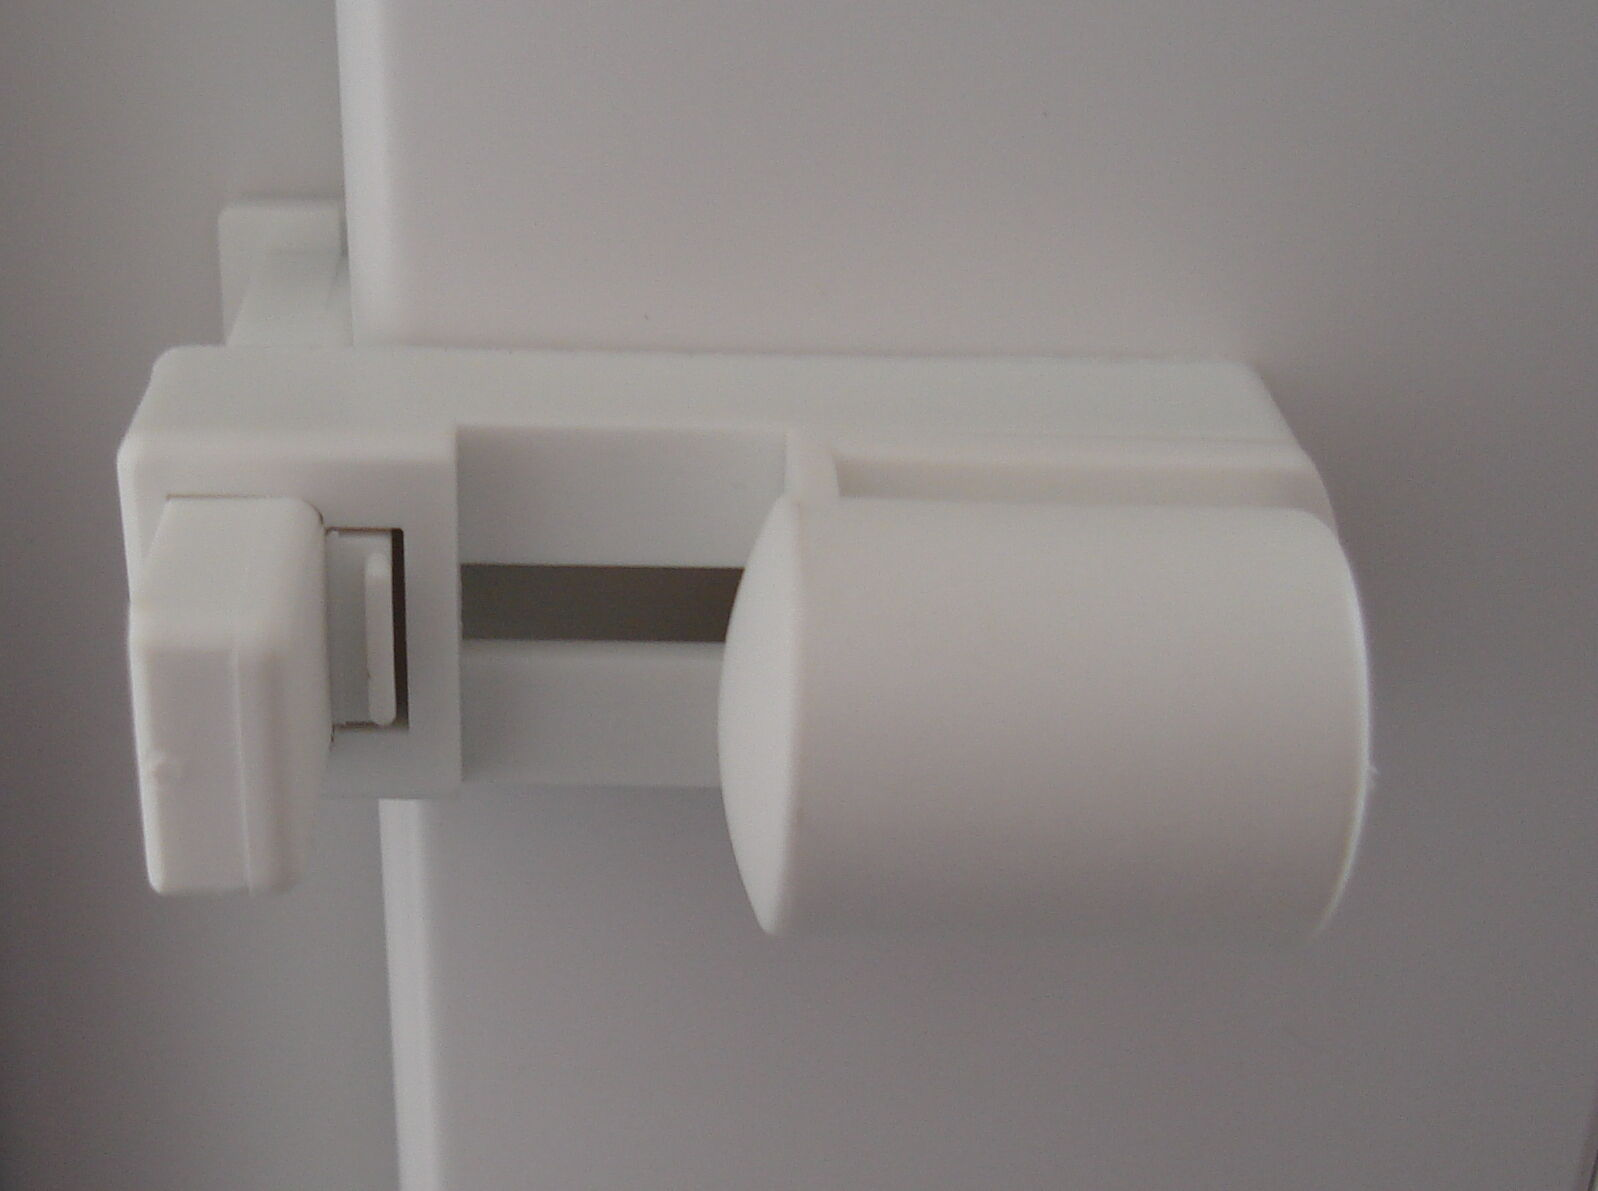 klemmtr ger f r scheibengardinen halterung f r gardinenstangen klemmhalter eur 5 95. Black Bedroom Furniture Sets. Home Design Ideas